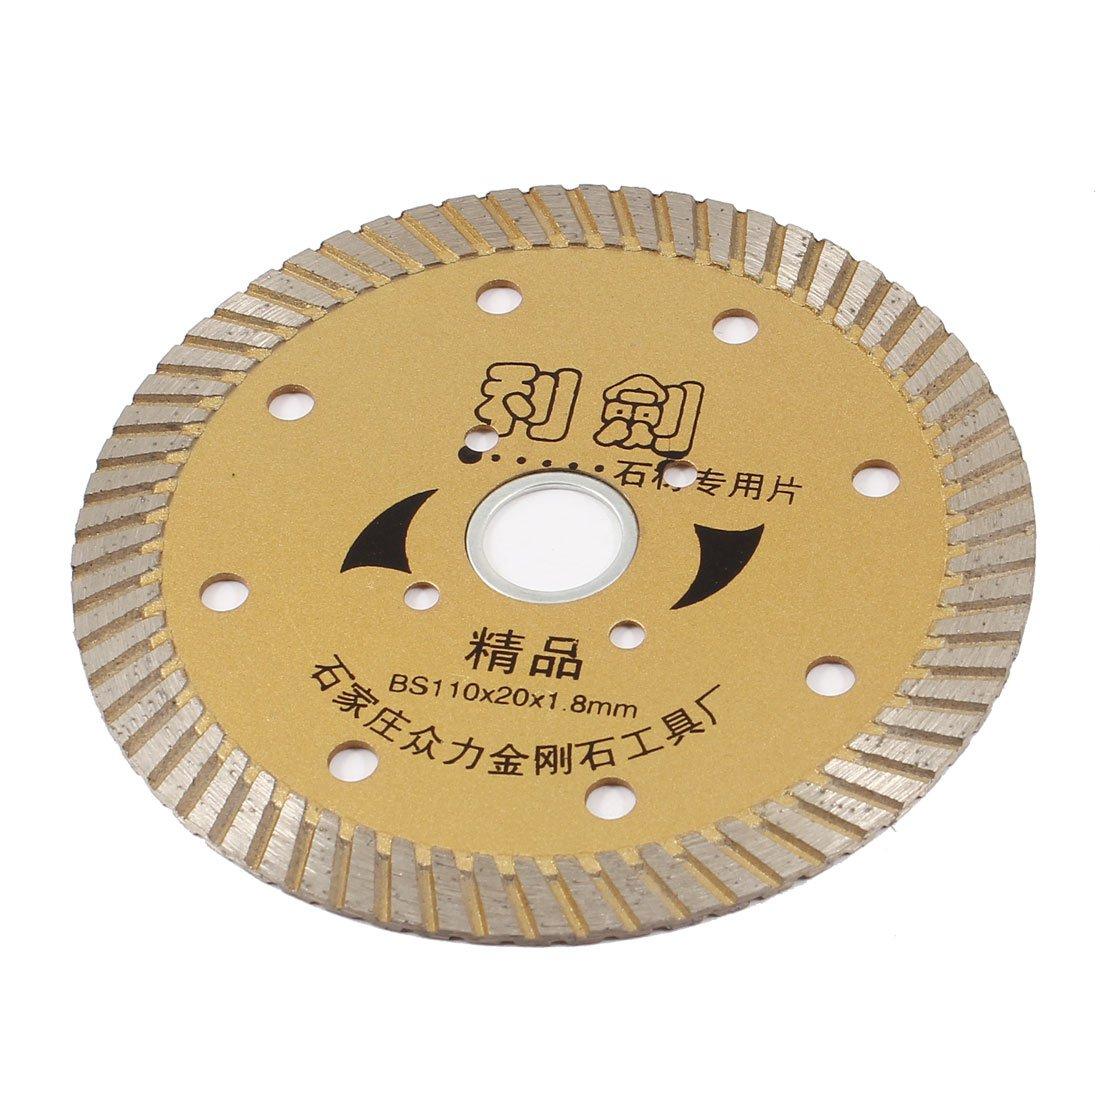 uxcell Bronze Tone Tile Cutting Wheel Diamond Saw Cutter 110mm x 20mm x 1.8mm